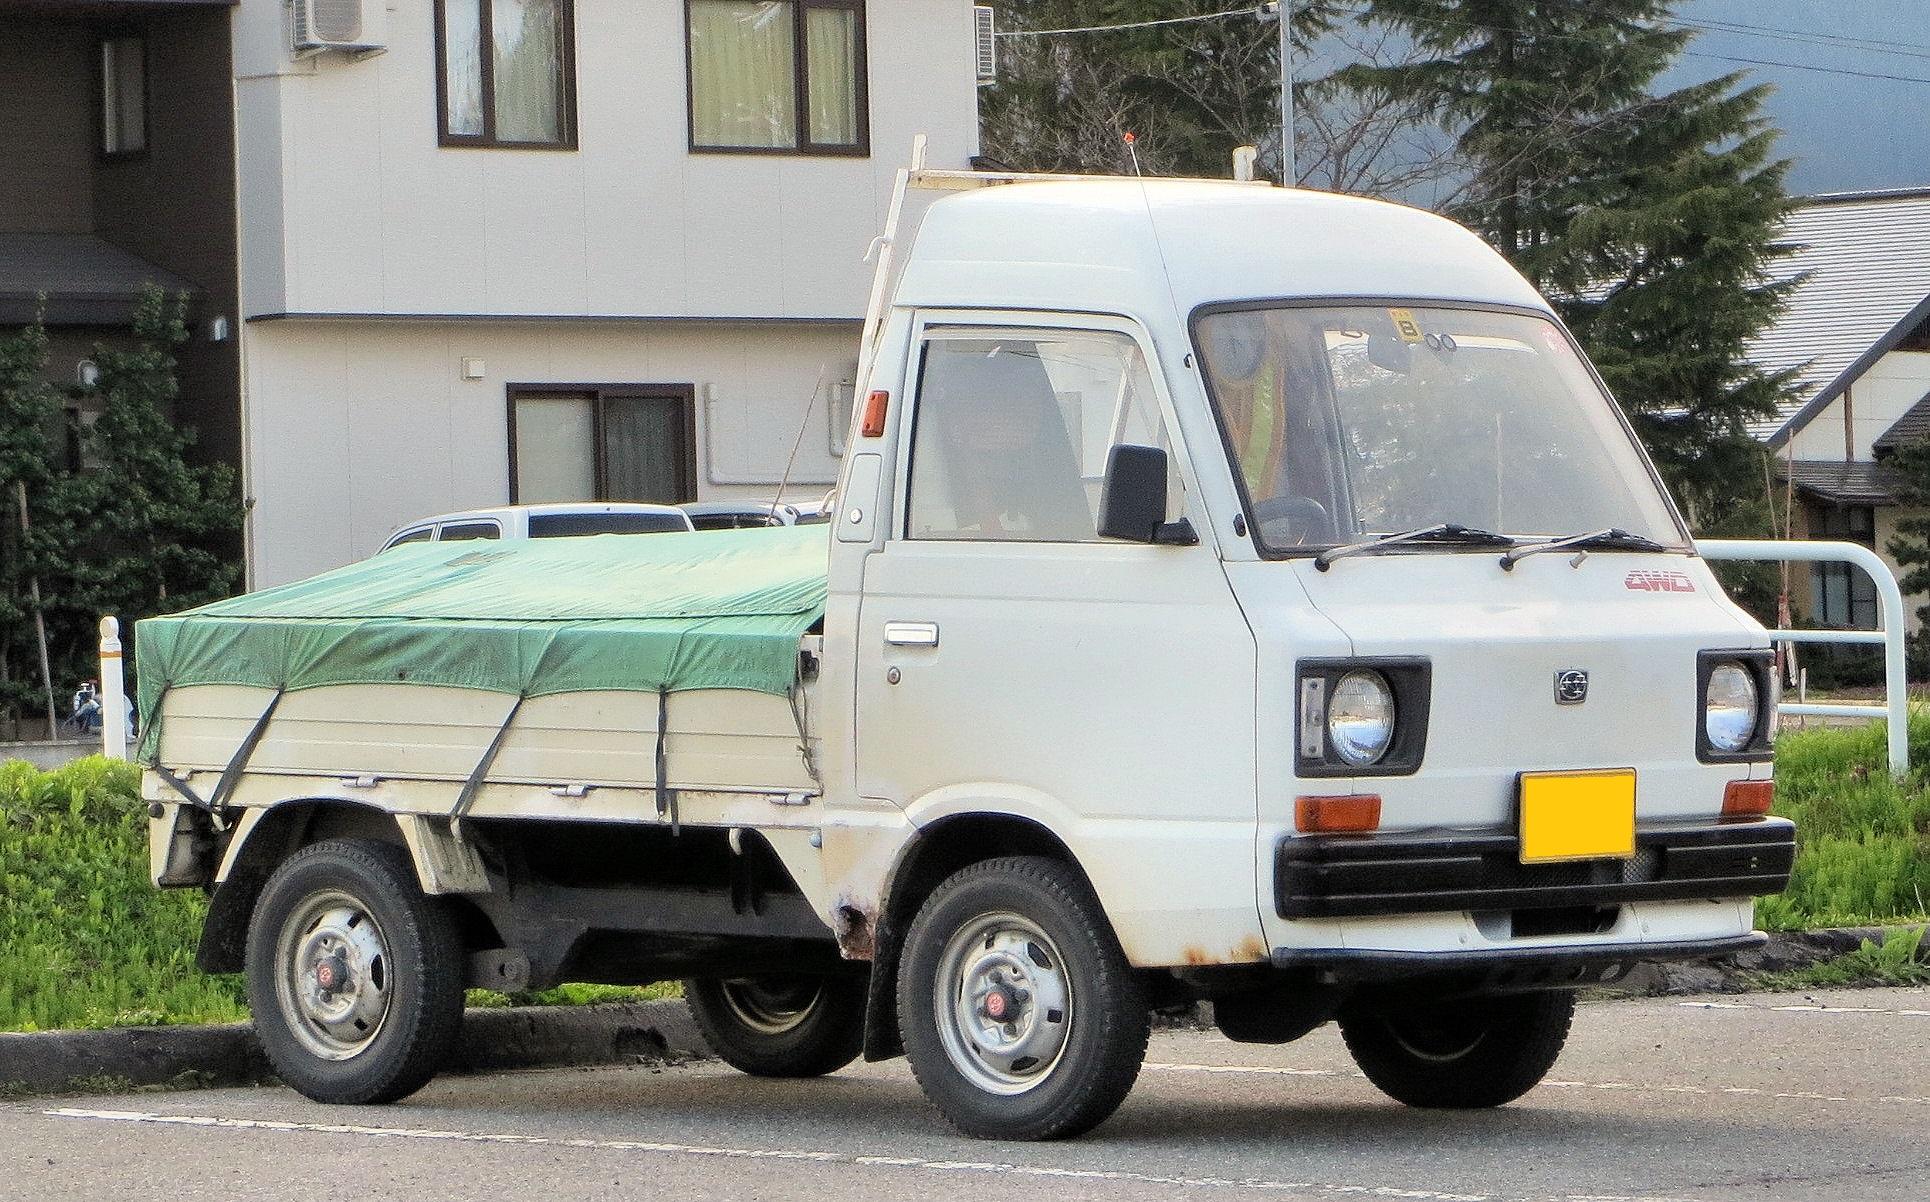 http://upload.wikimedia.org/wikipedia/commons/3/3d/Subaru_Sambar_Truck_4WD_0020.JPG